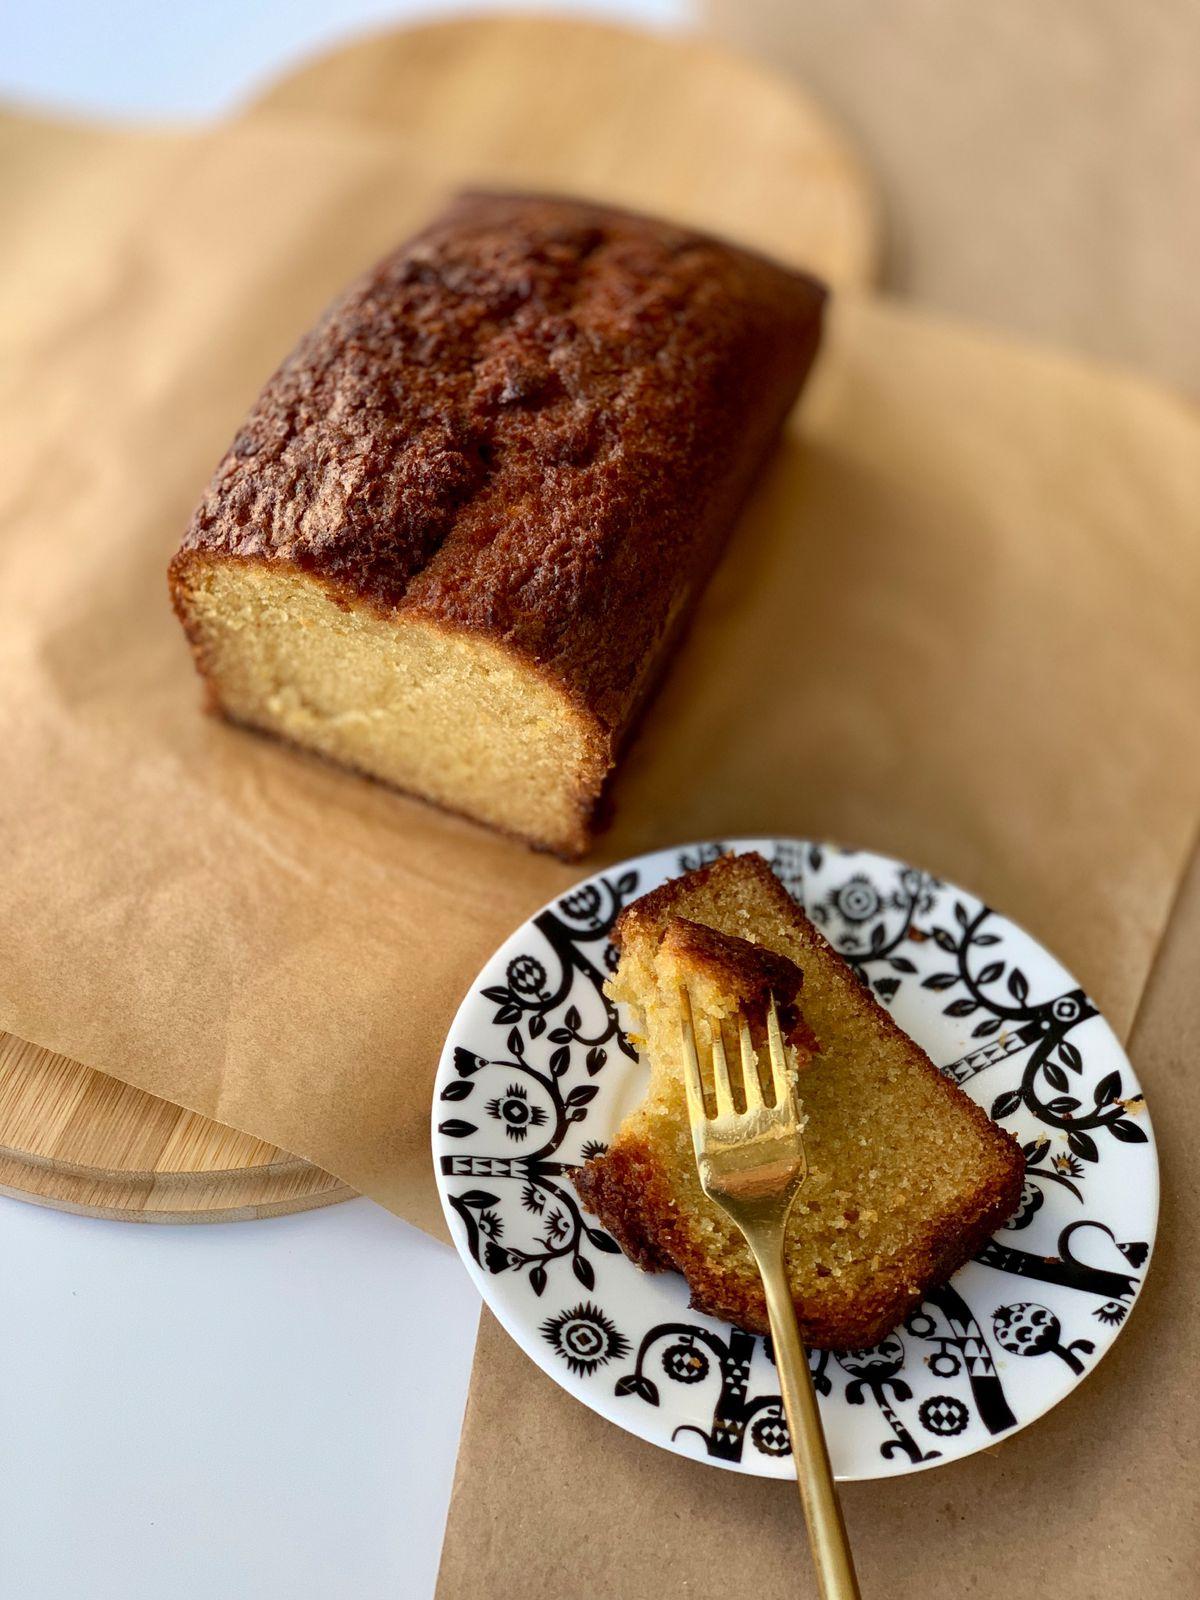 Seven Grams Caffe olive oil bread